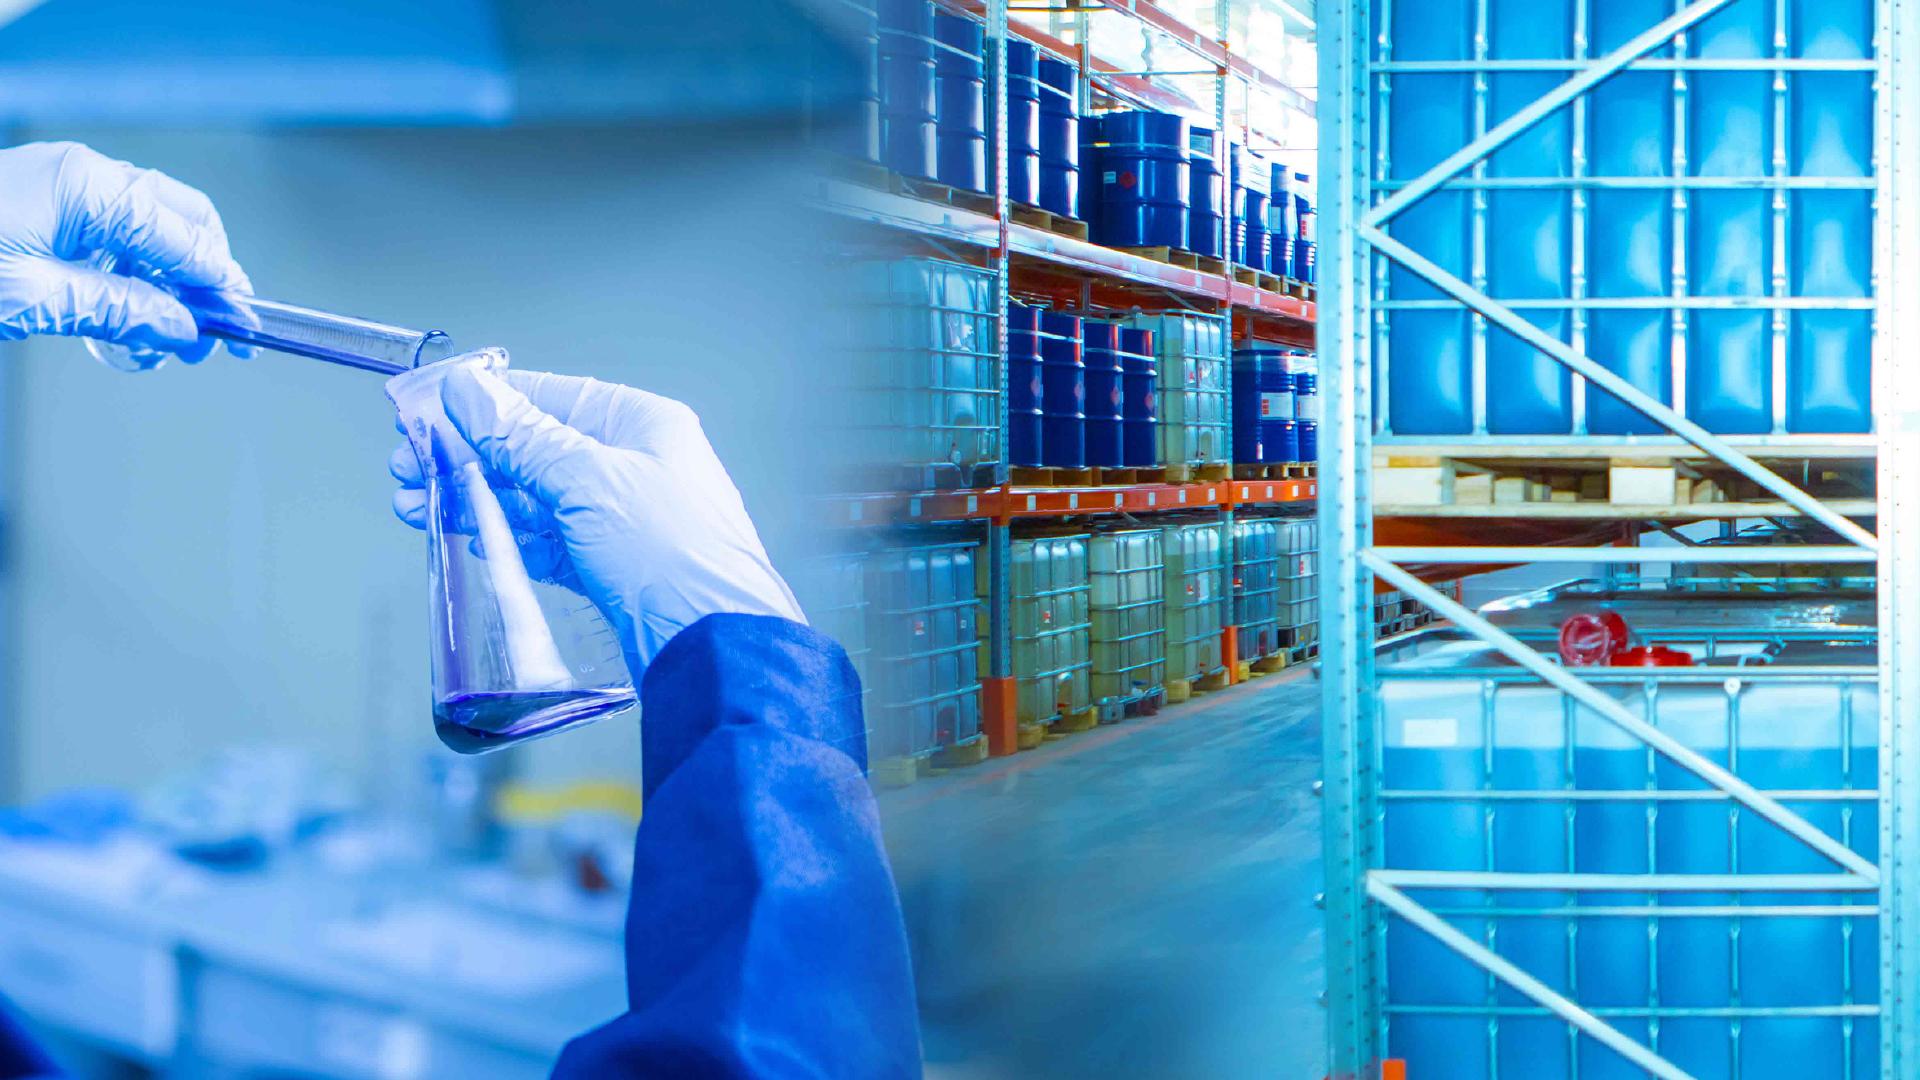 966329 - Detechtion Chemical Management Graphics_020321_966329 - Detechtion Chemical Management Graphics 5_020321